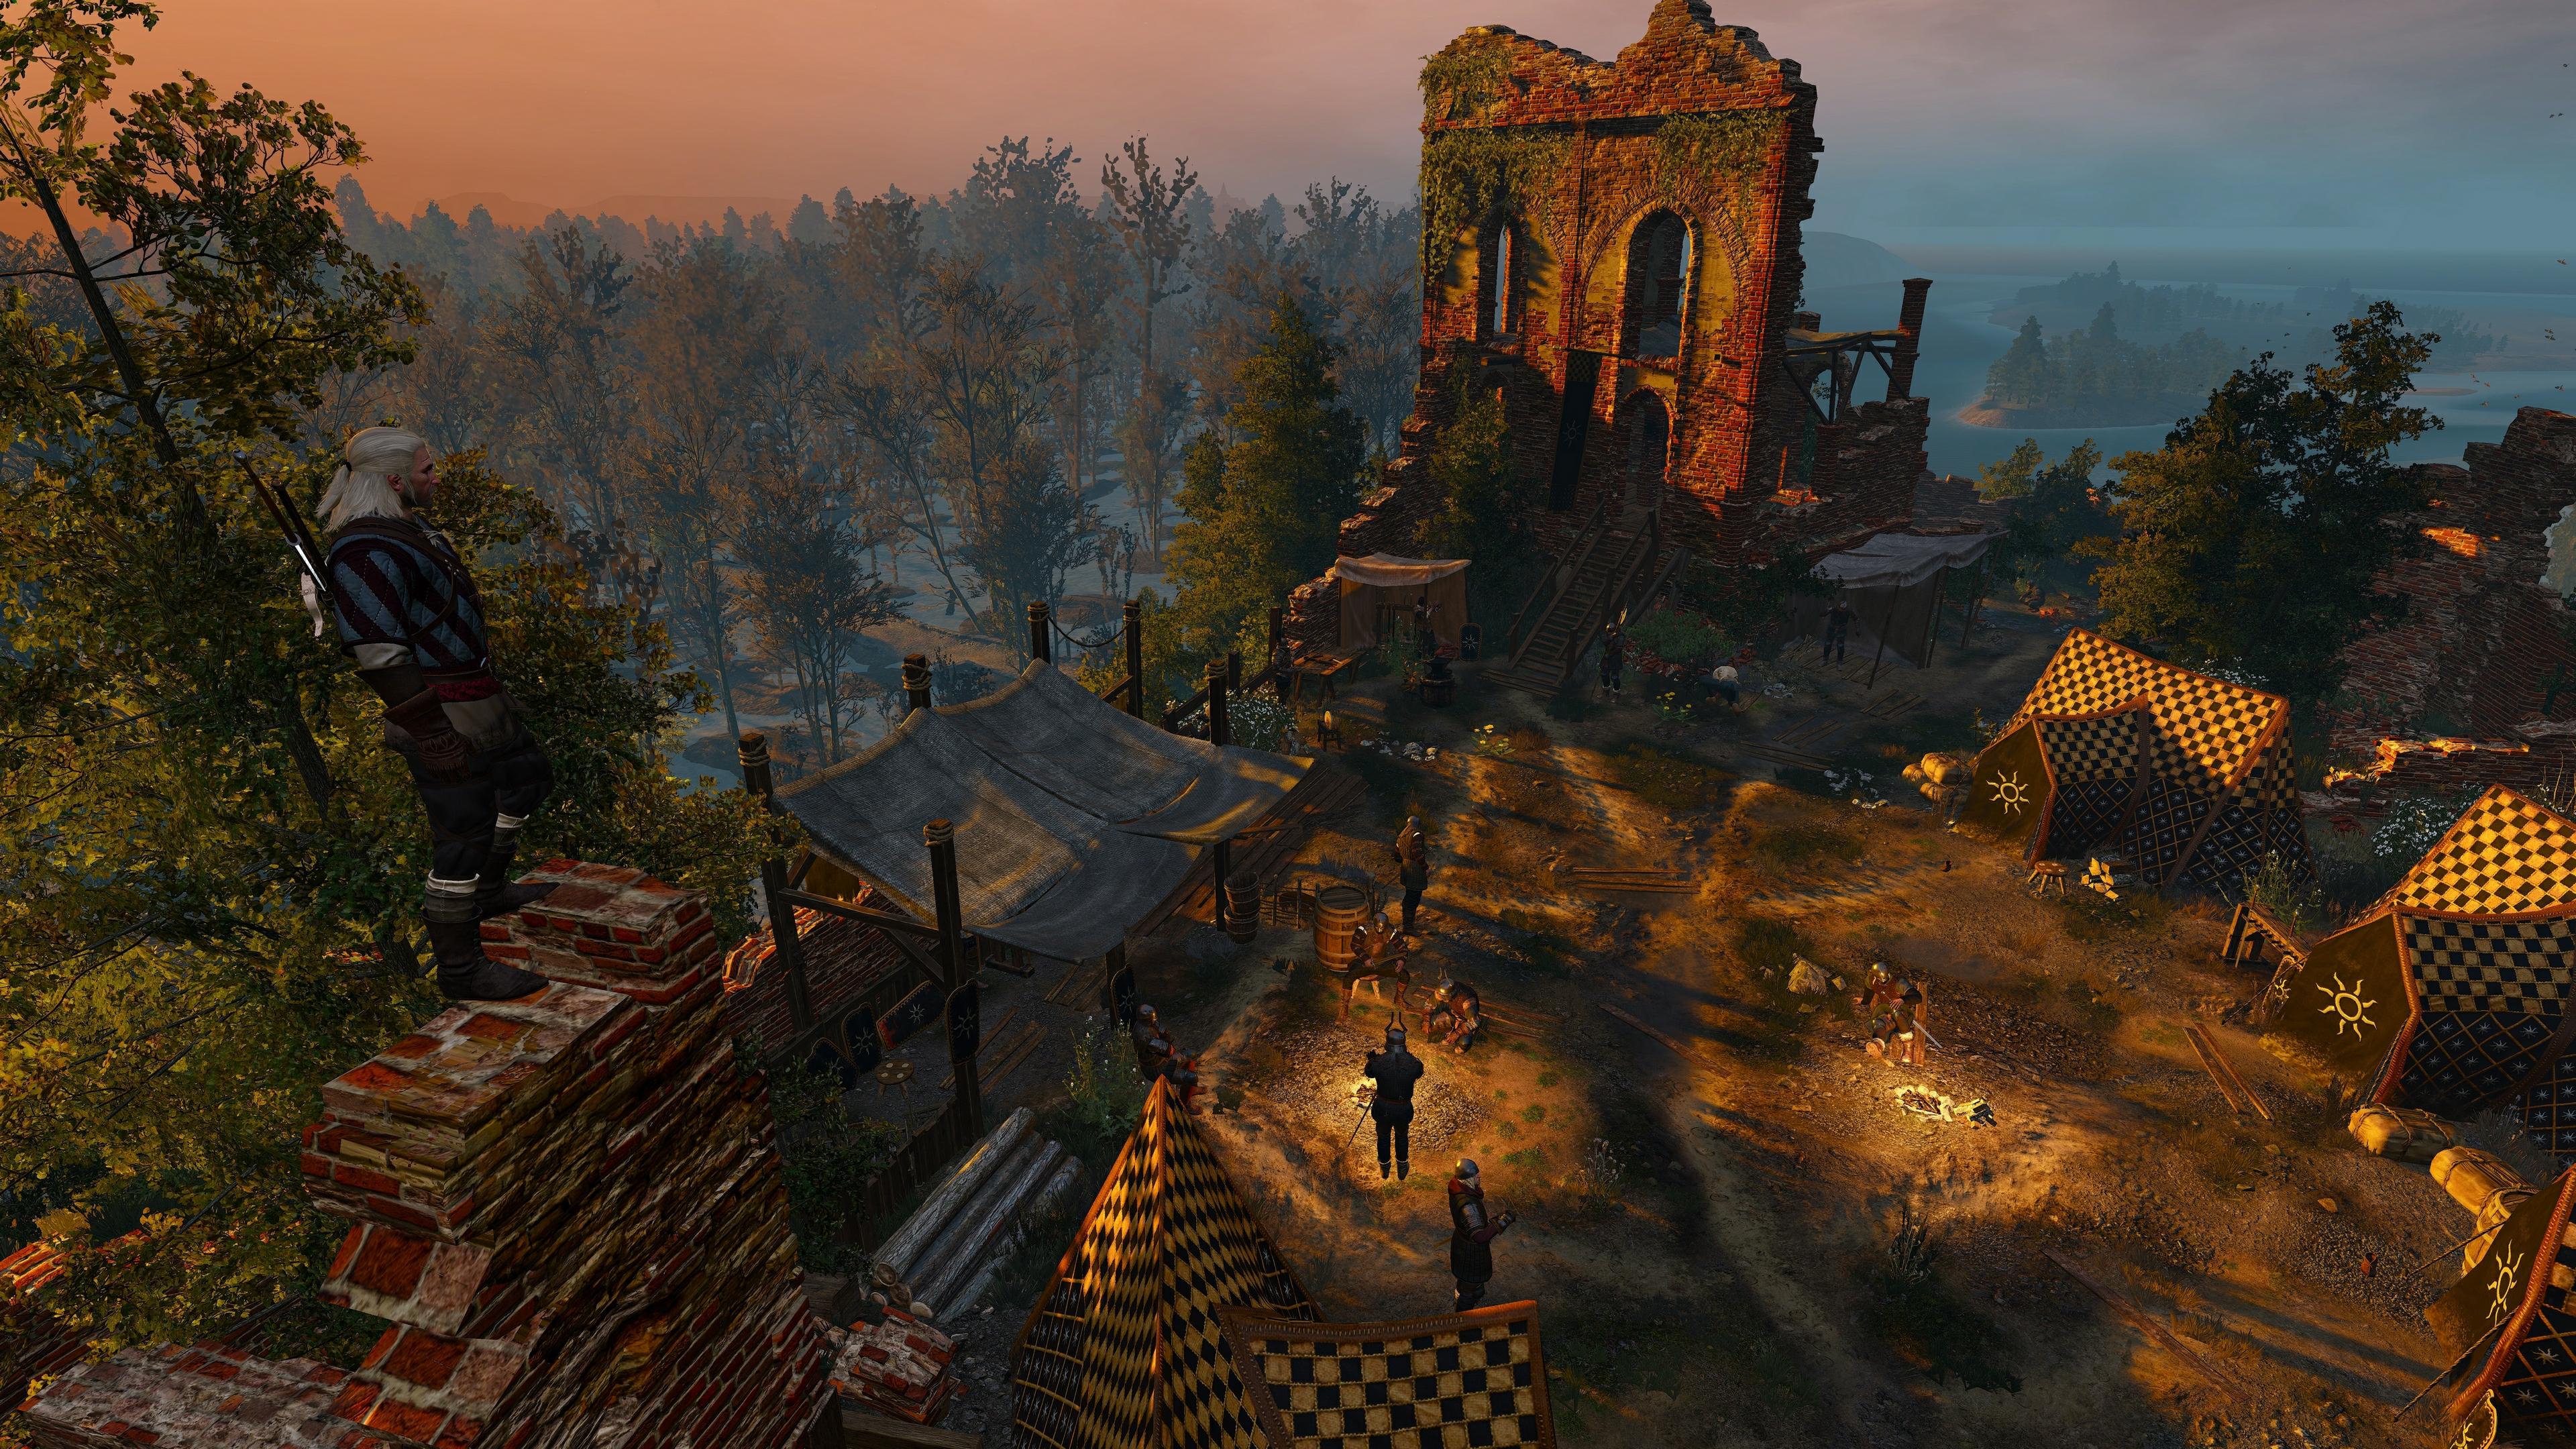 The Witcher 3 Screenshot 2020.07.20 - 20.23.13.16.jpg - The Witcher 3: Wild Hunt